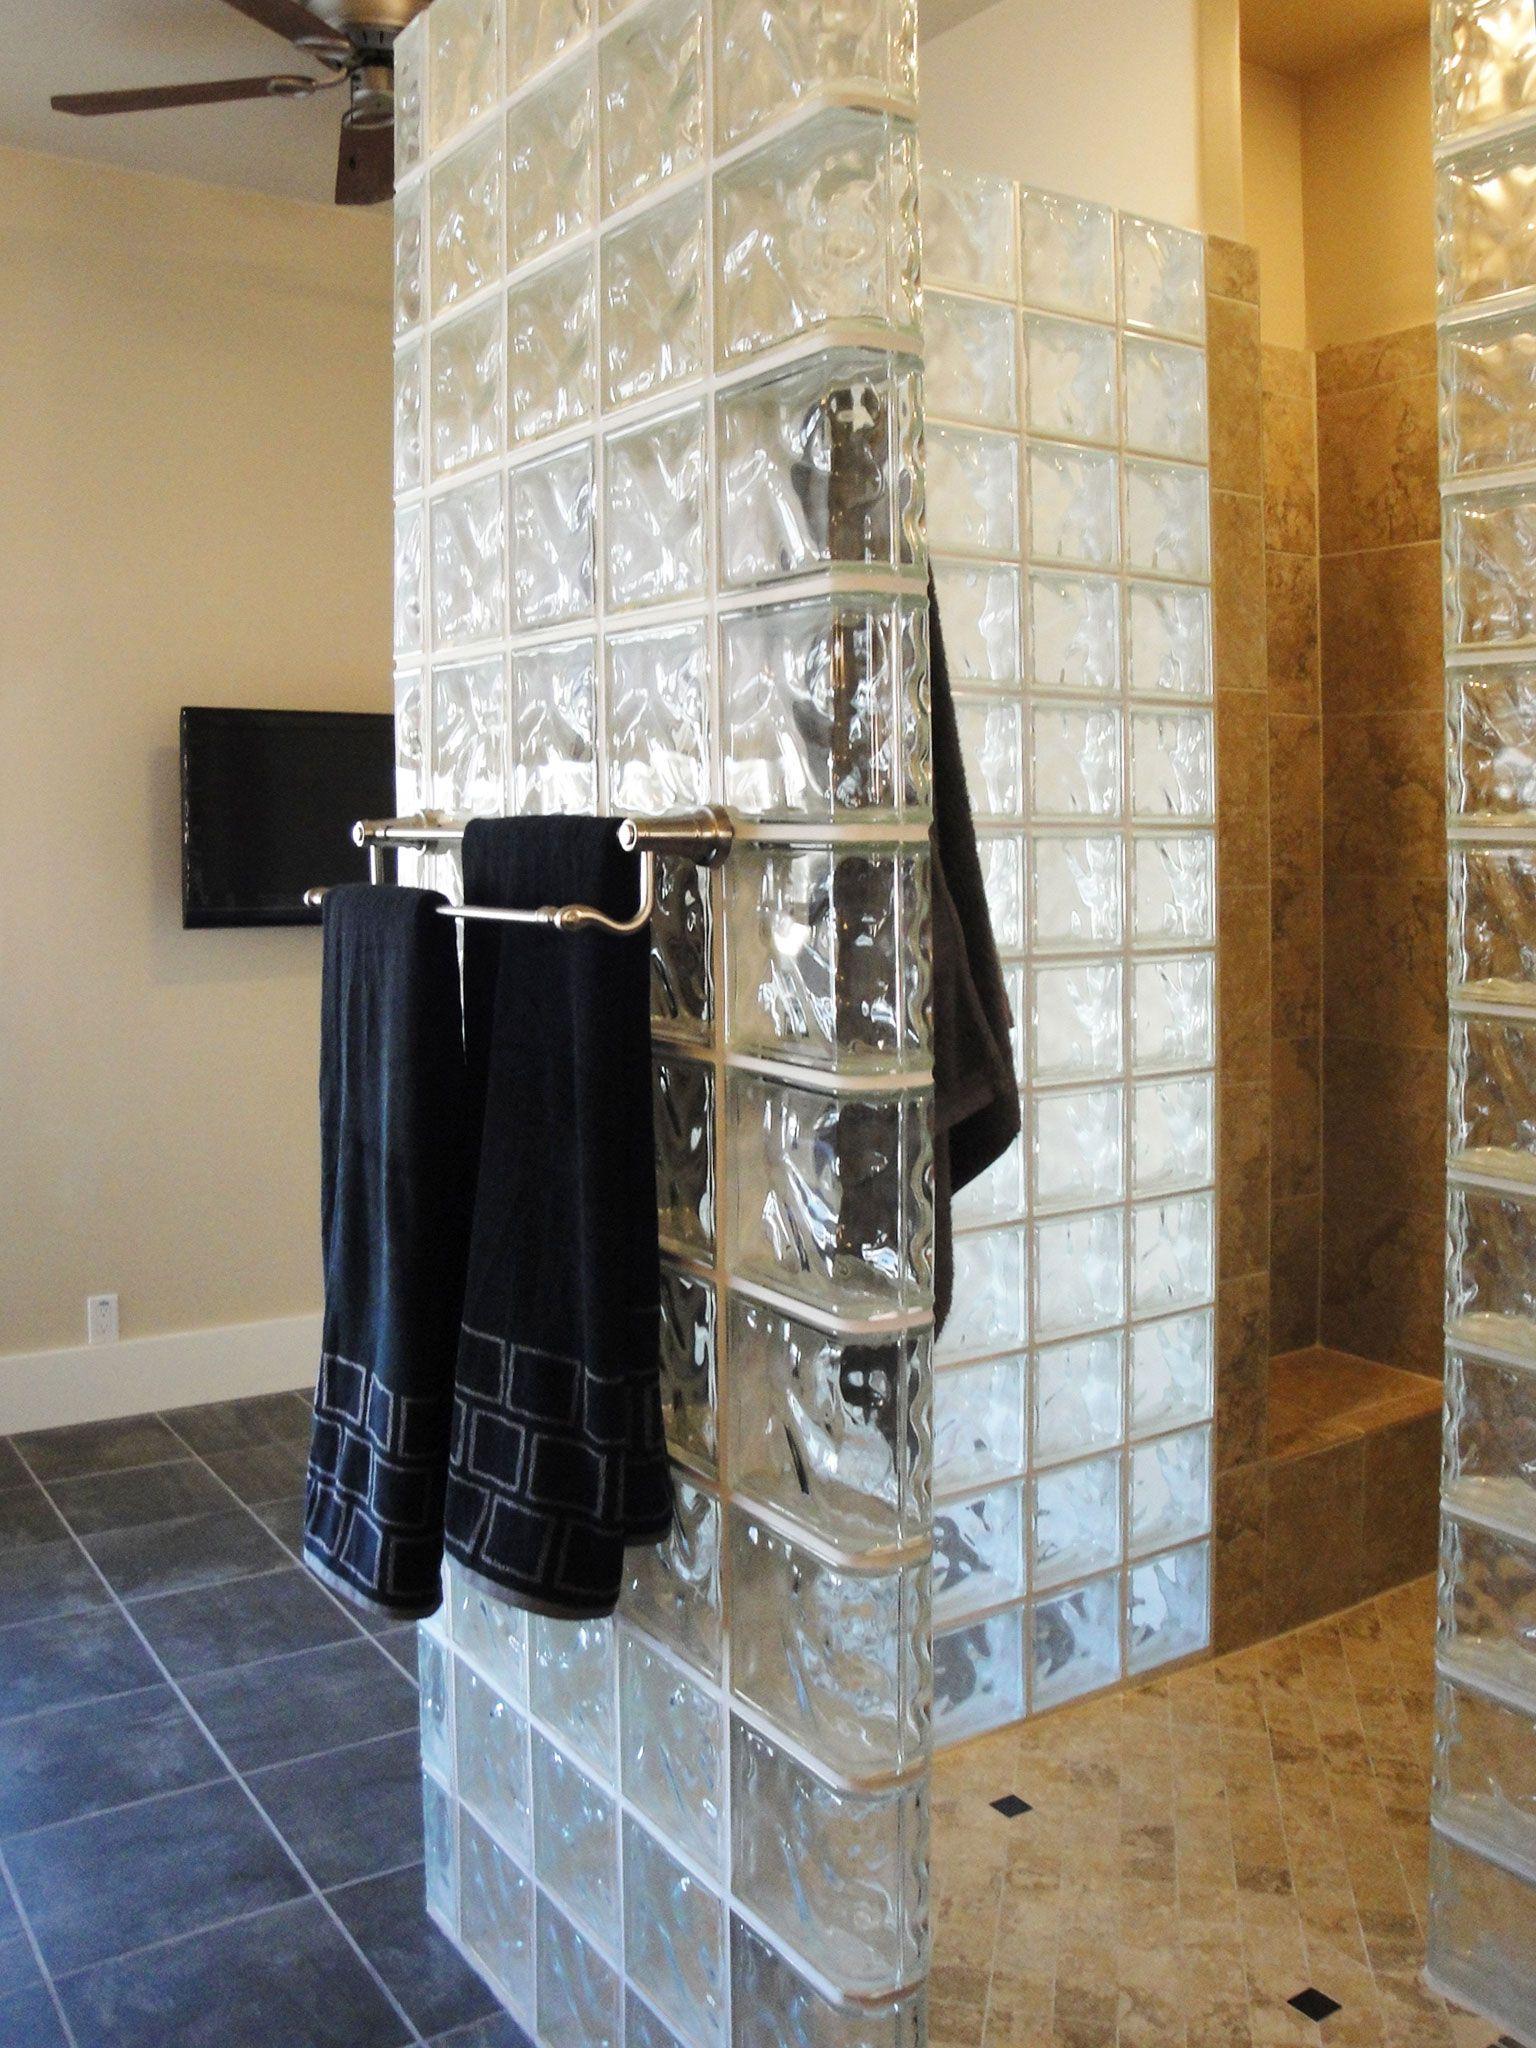 Glass block bathroom bathroom - Glass Block Shower Like The Towel Bar In Block Bathroom